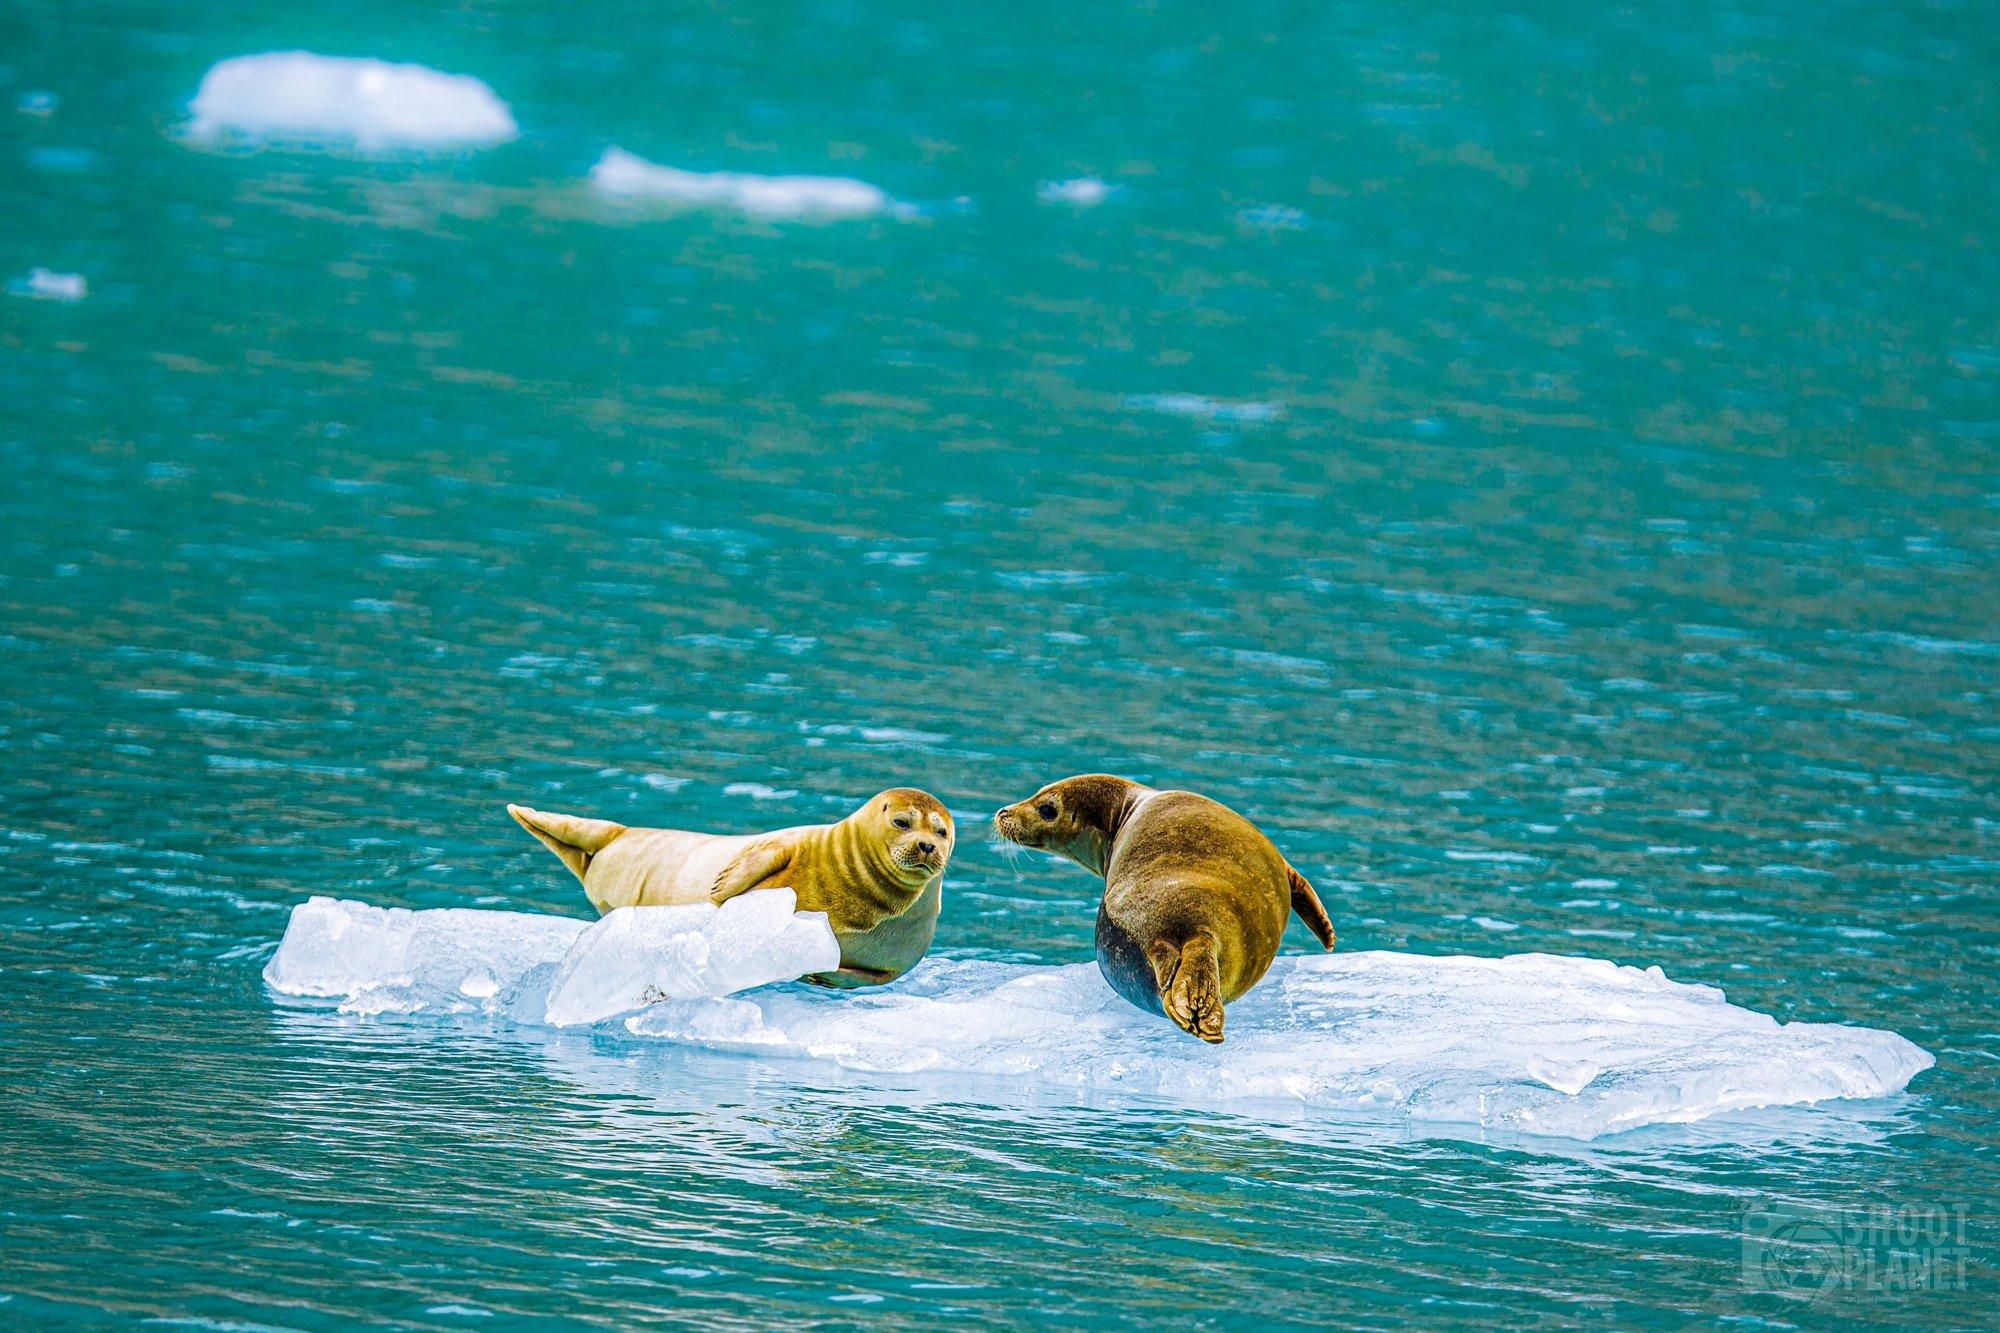 Harbor seals on ice, Kenai Fjords Alaska